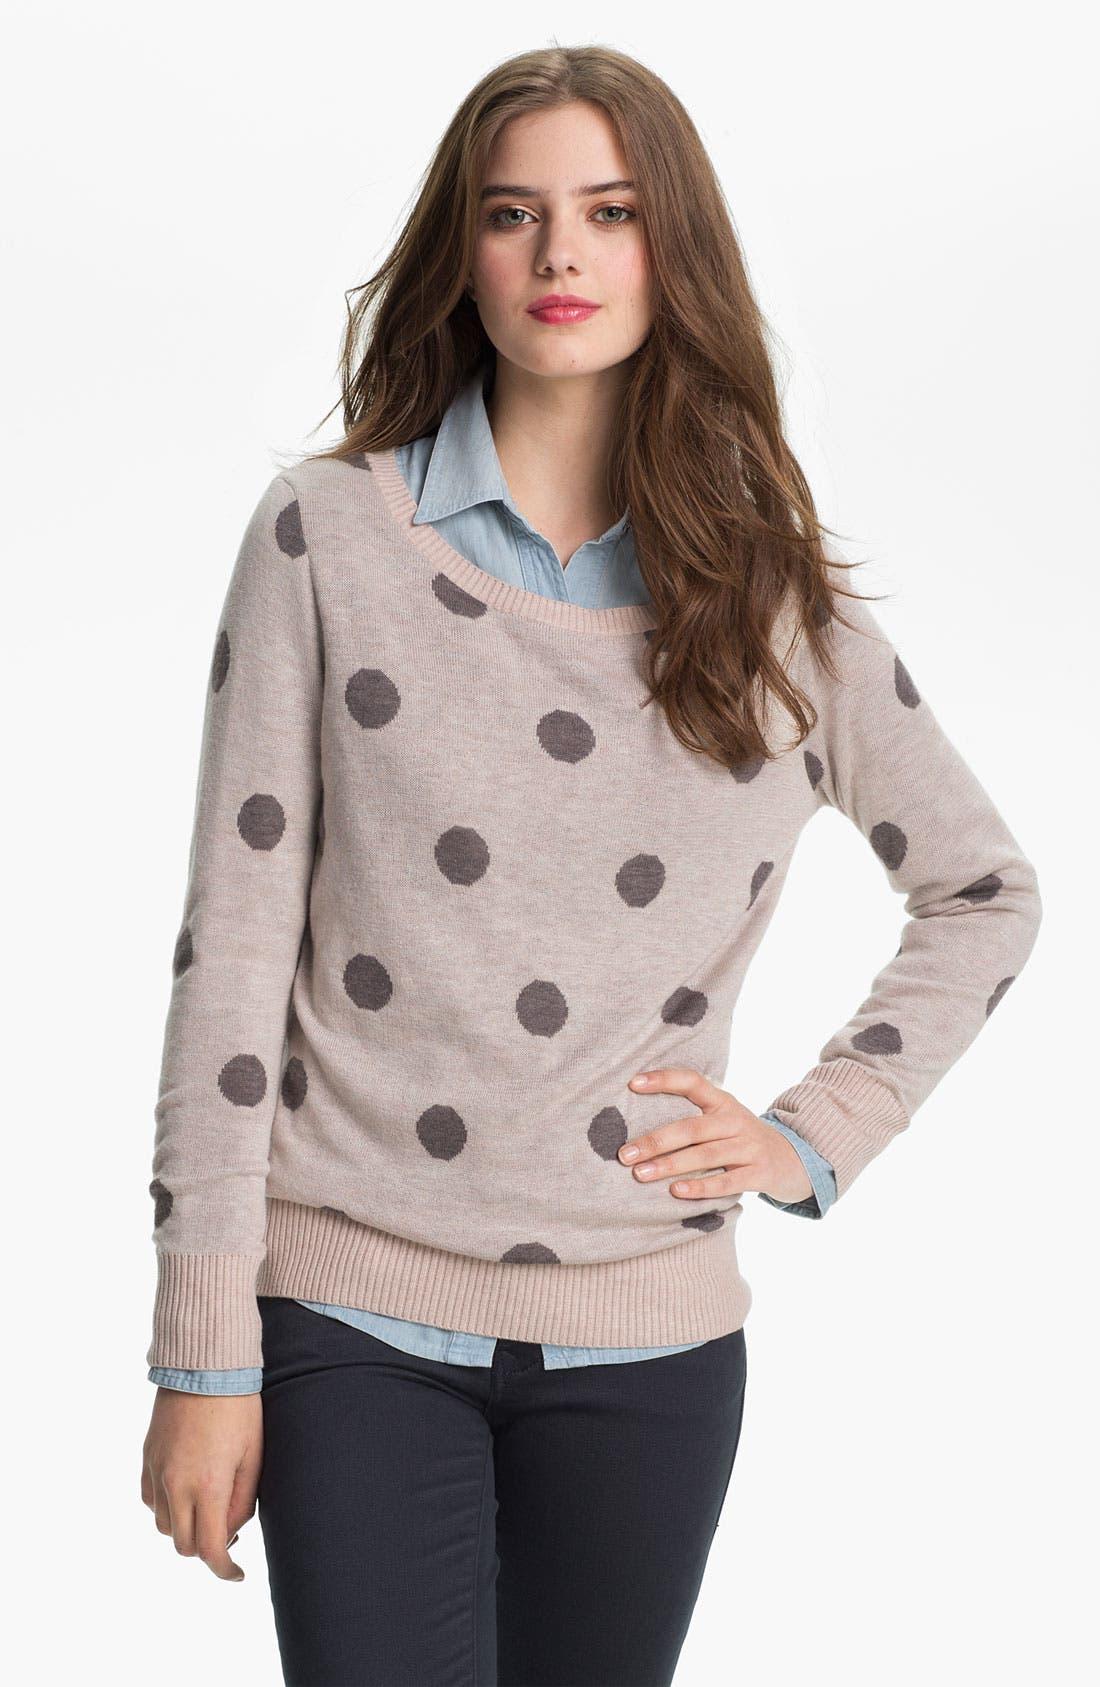 Main Image - Max & Mia 'Big Dot' Sweater